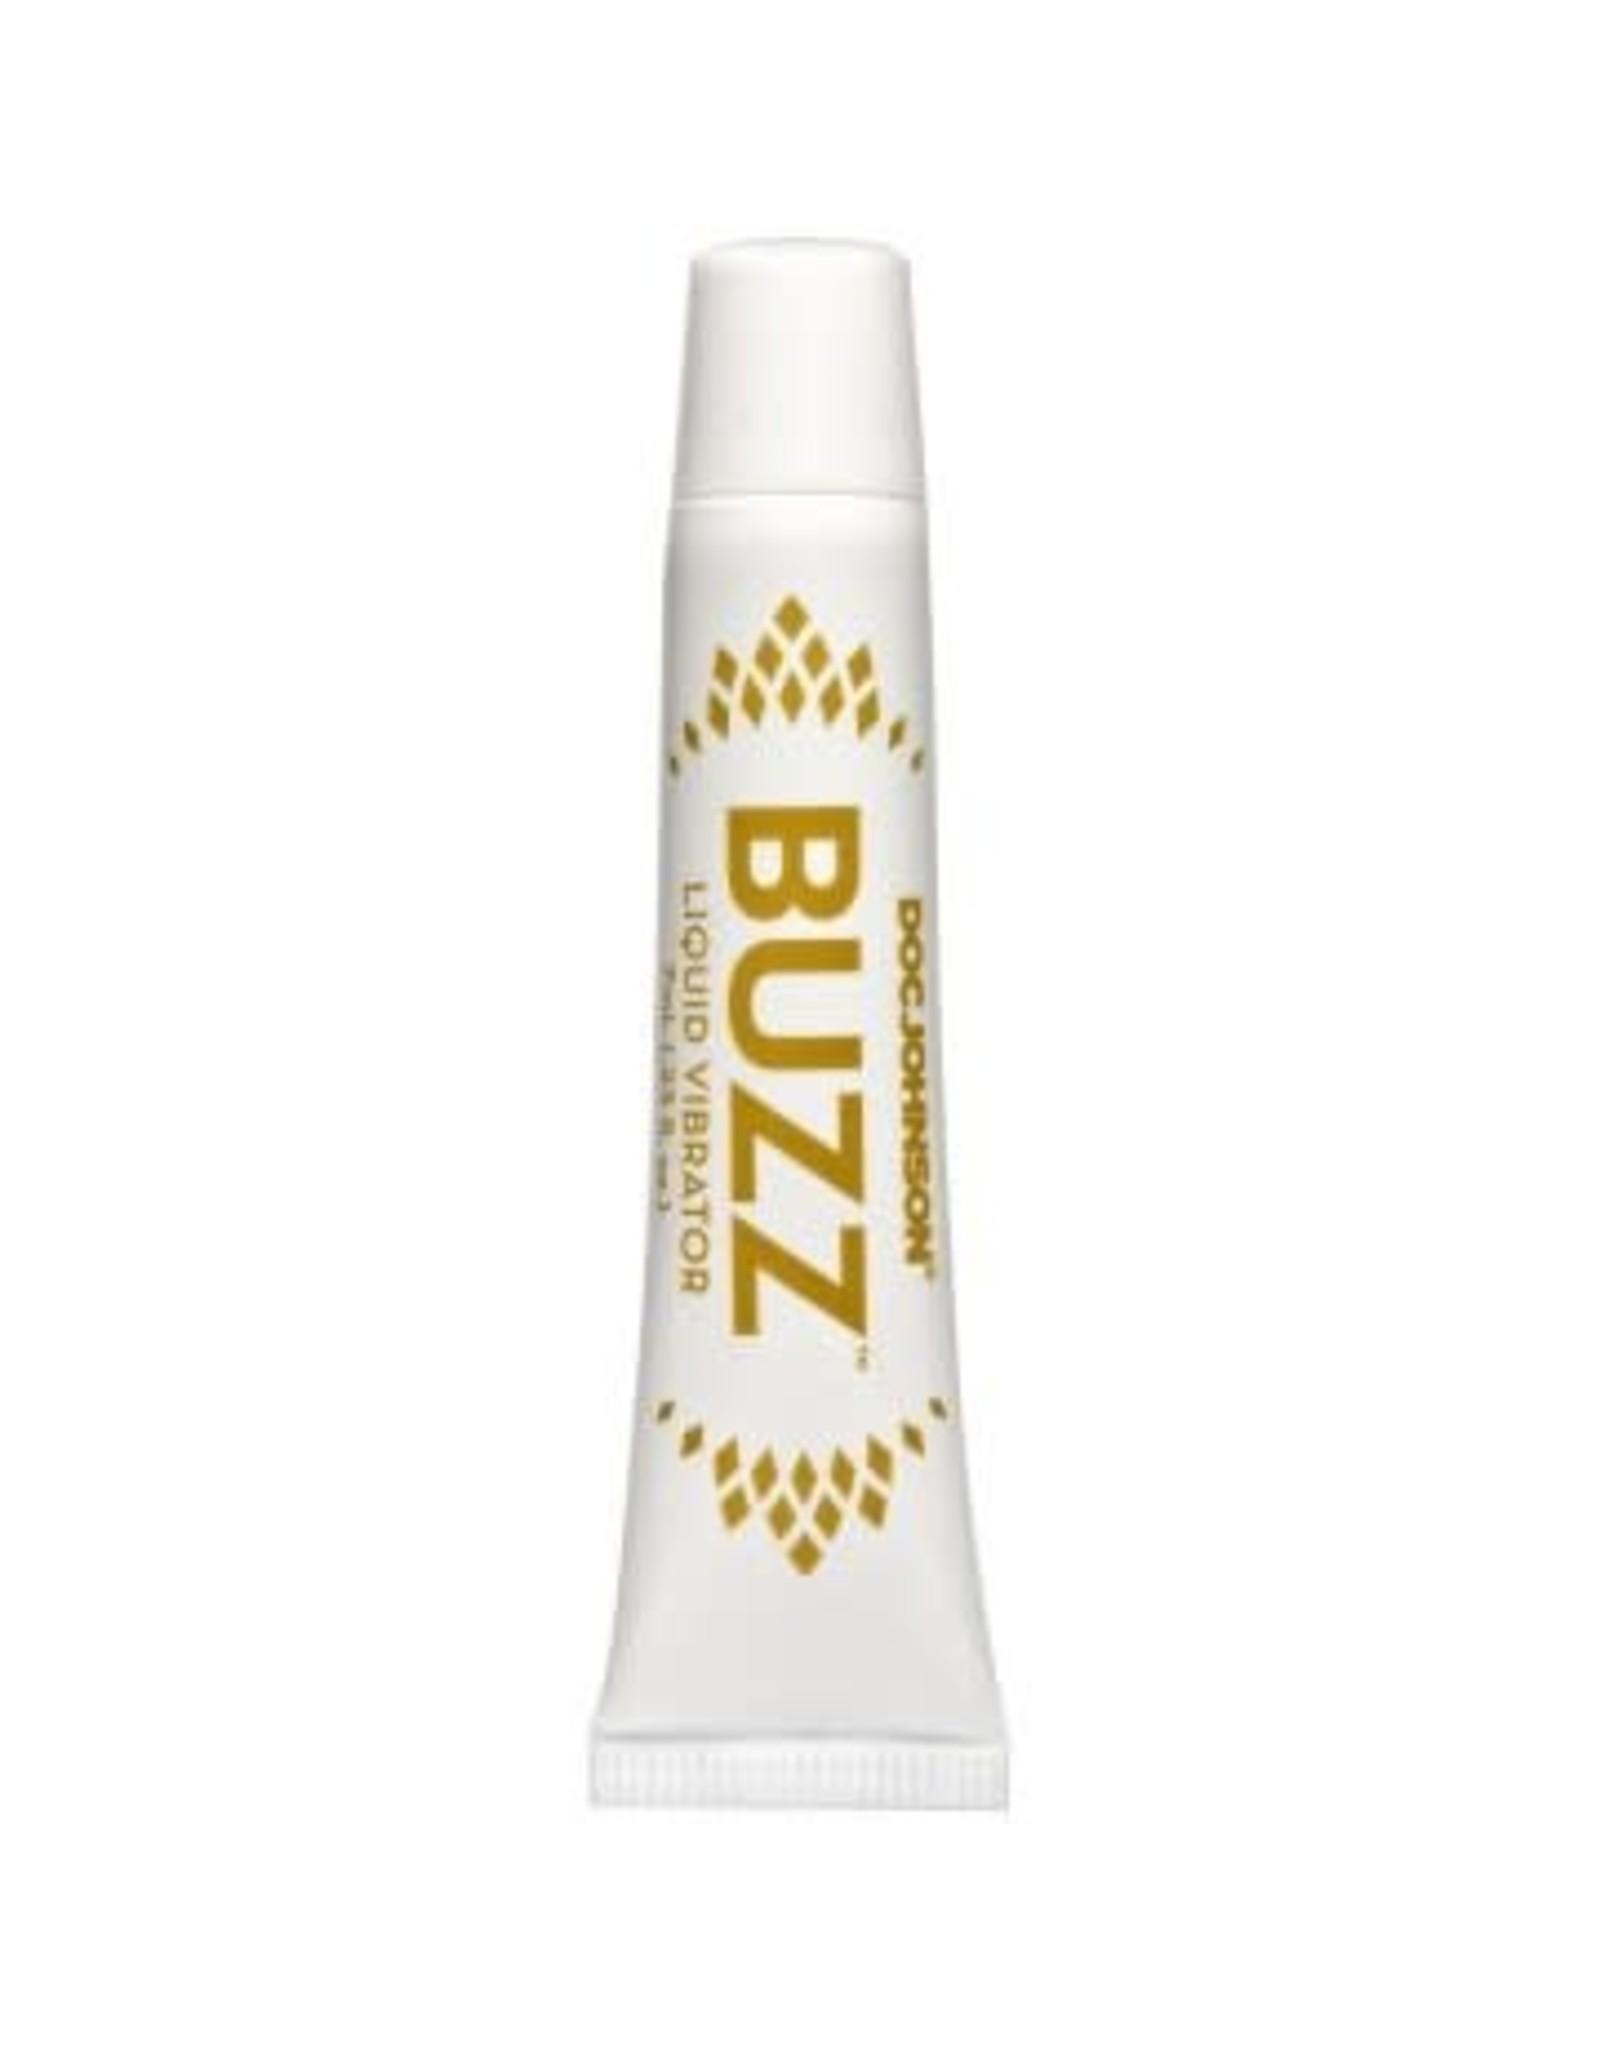 BUZZ THE LIQUID VIBRATOR